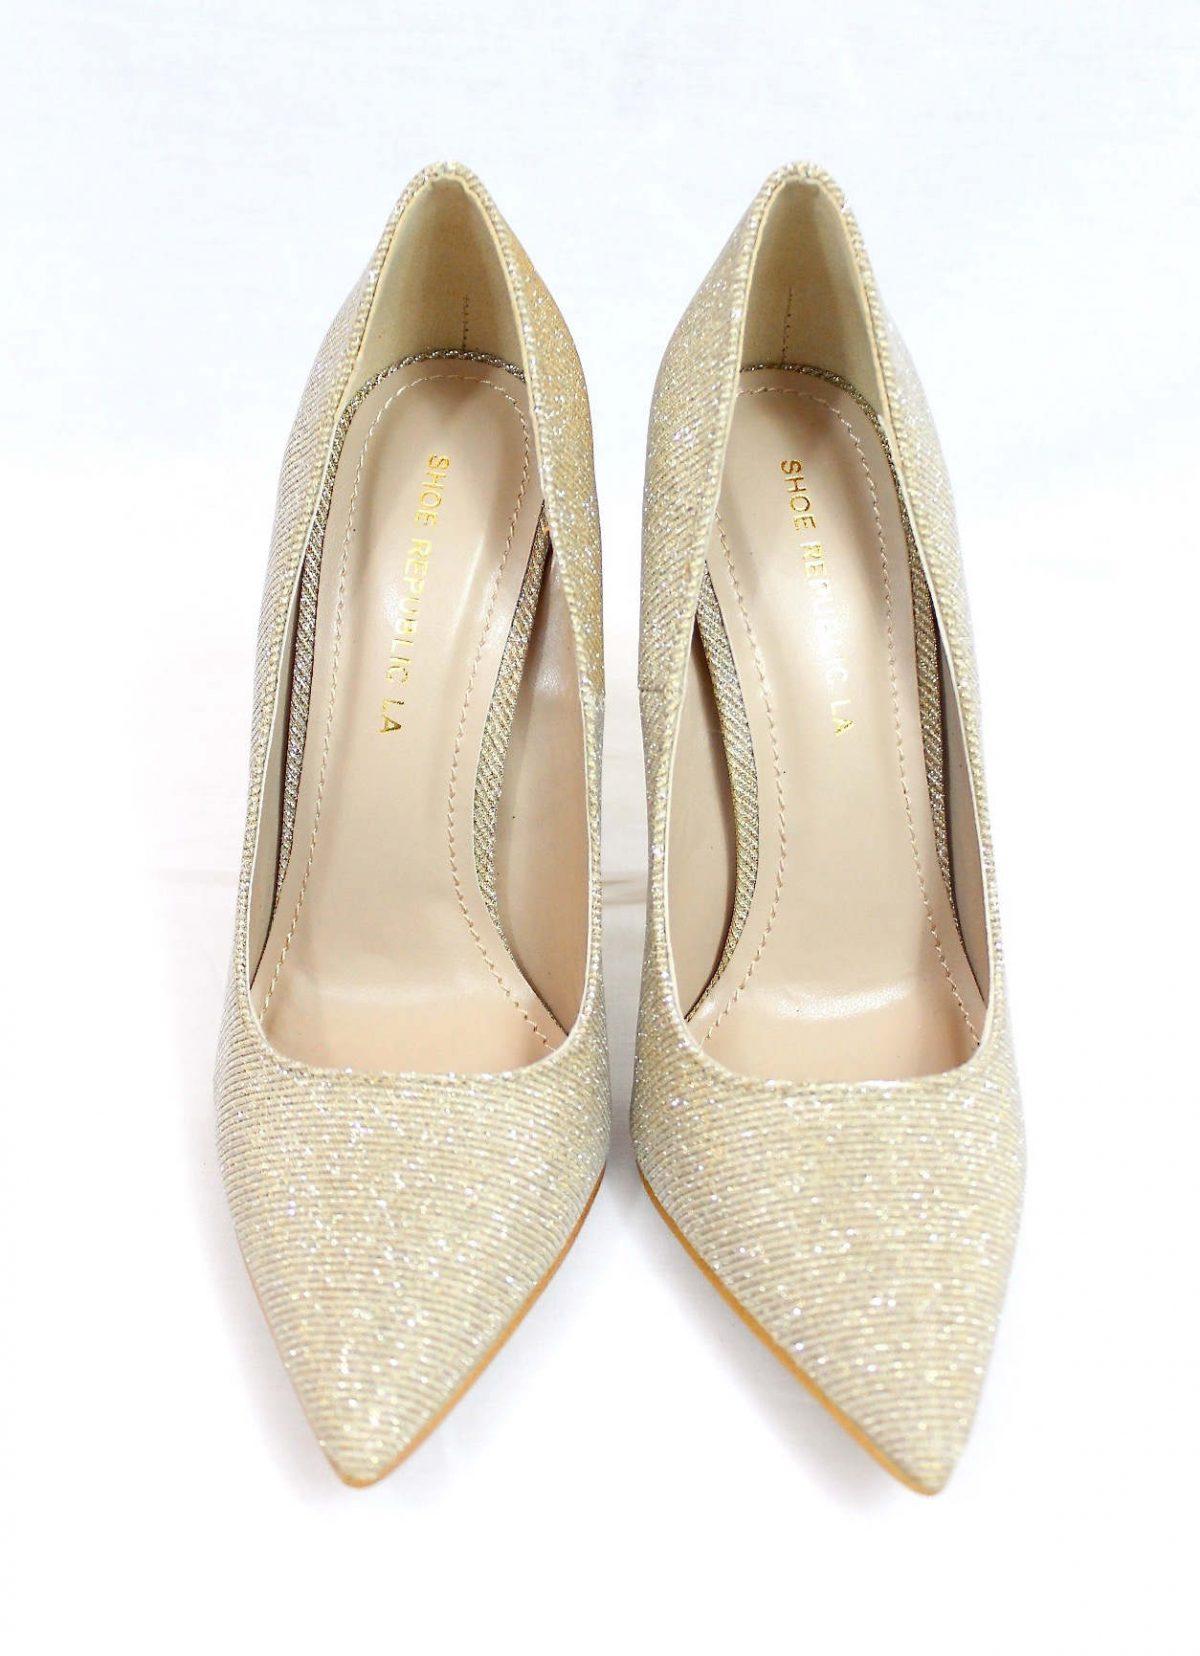 Shoe Republic Shiner Gold Pointy Toe Dress Stiletto Pumps-3406